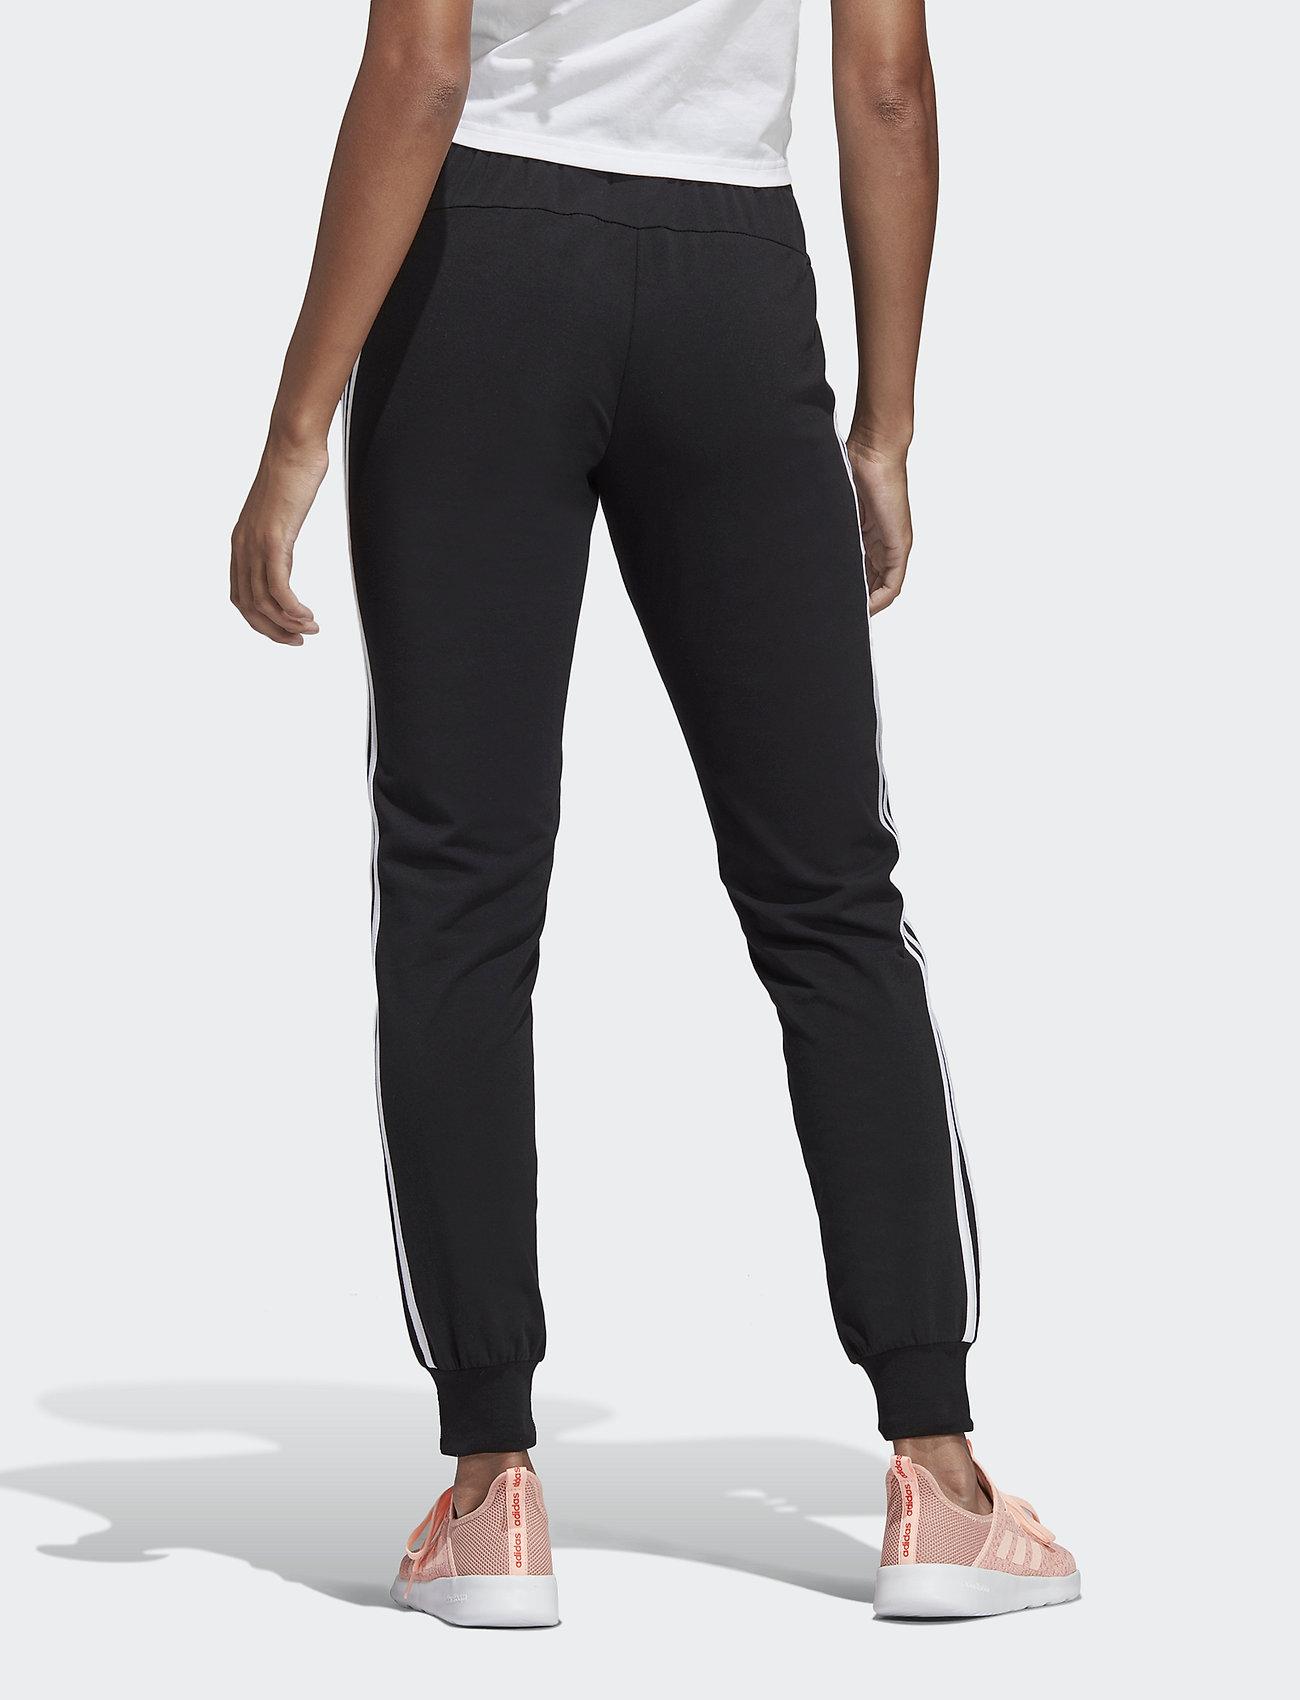 W E 3s Pant Sj (Black/white) (479 kr) - adidas Performance